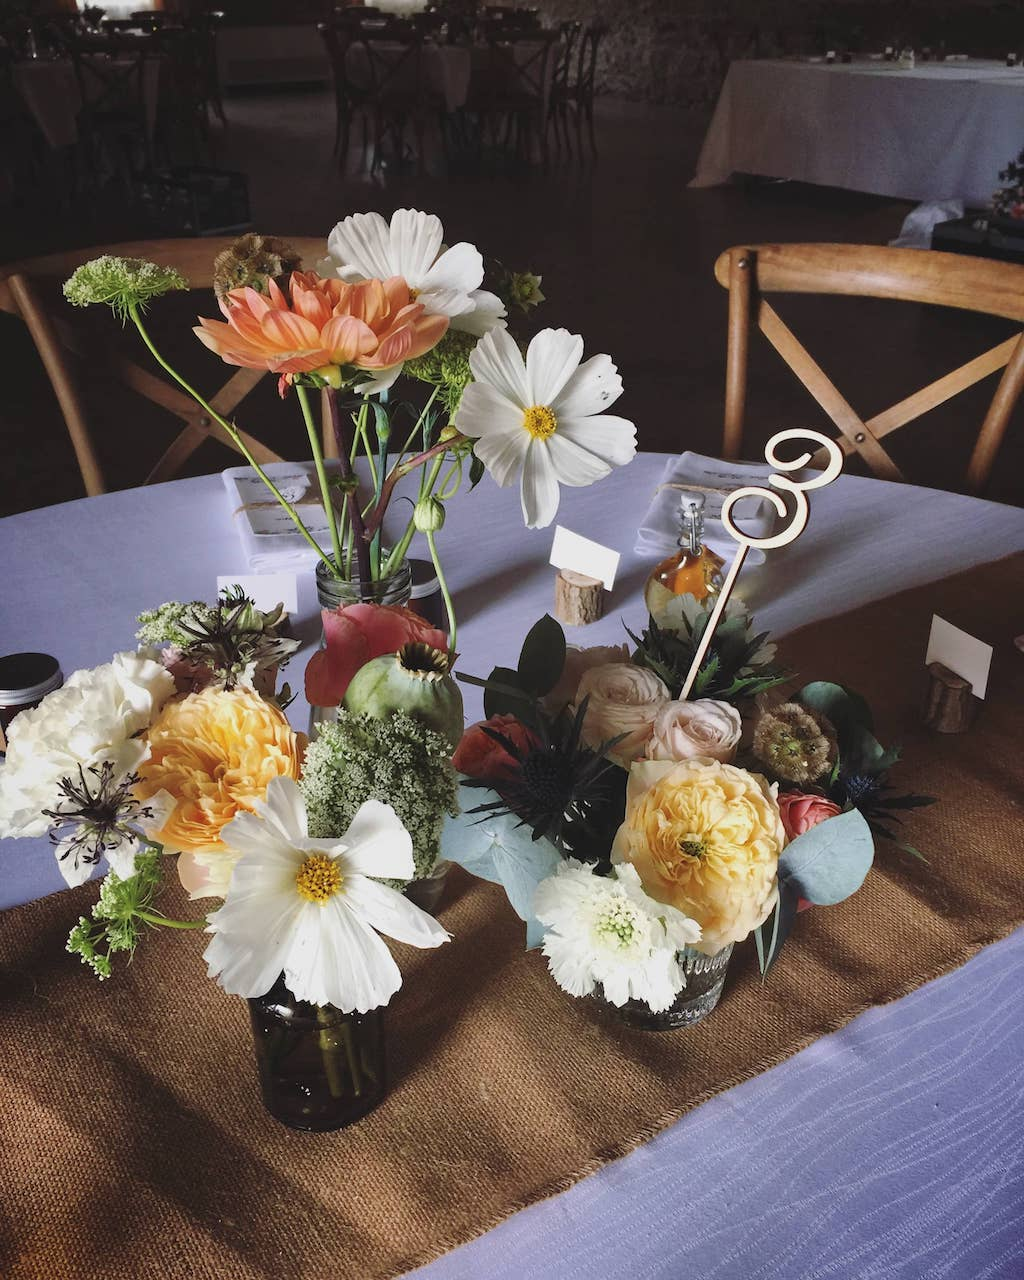 lieu-reception-centre-table-champetre-mariage